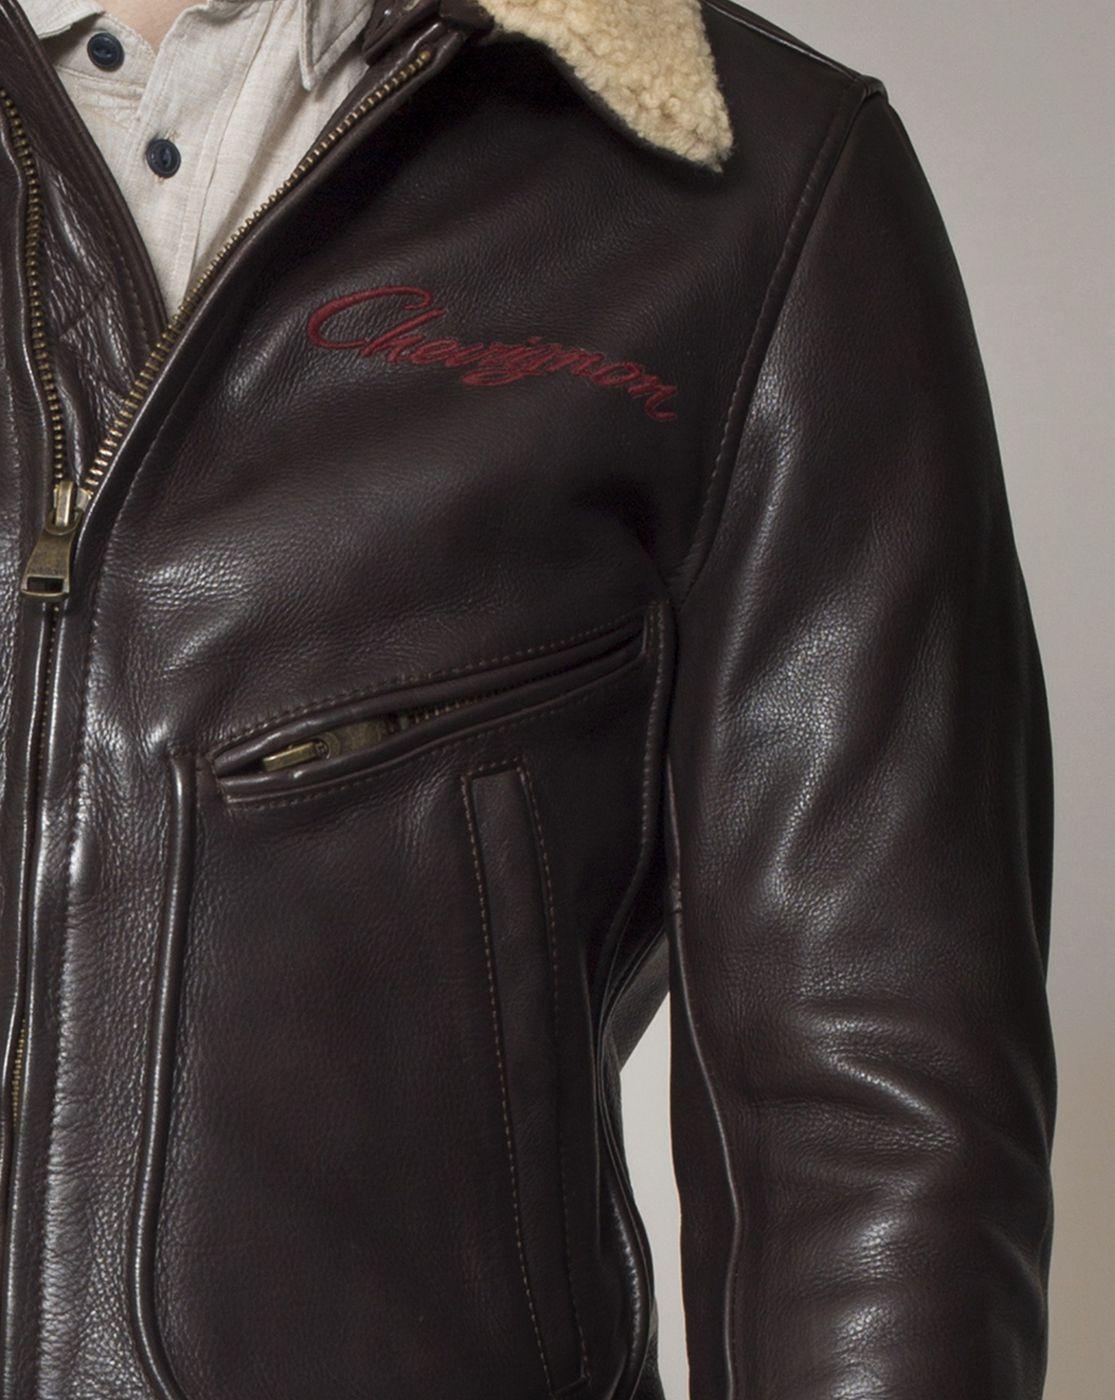 57ec6a8e39a Blouson motard cuir homme Chevignon x Helstons marron MAC automne hiver 2014